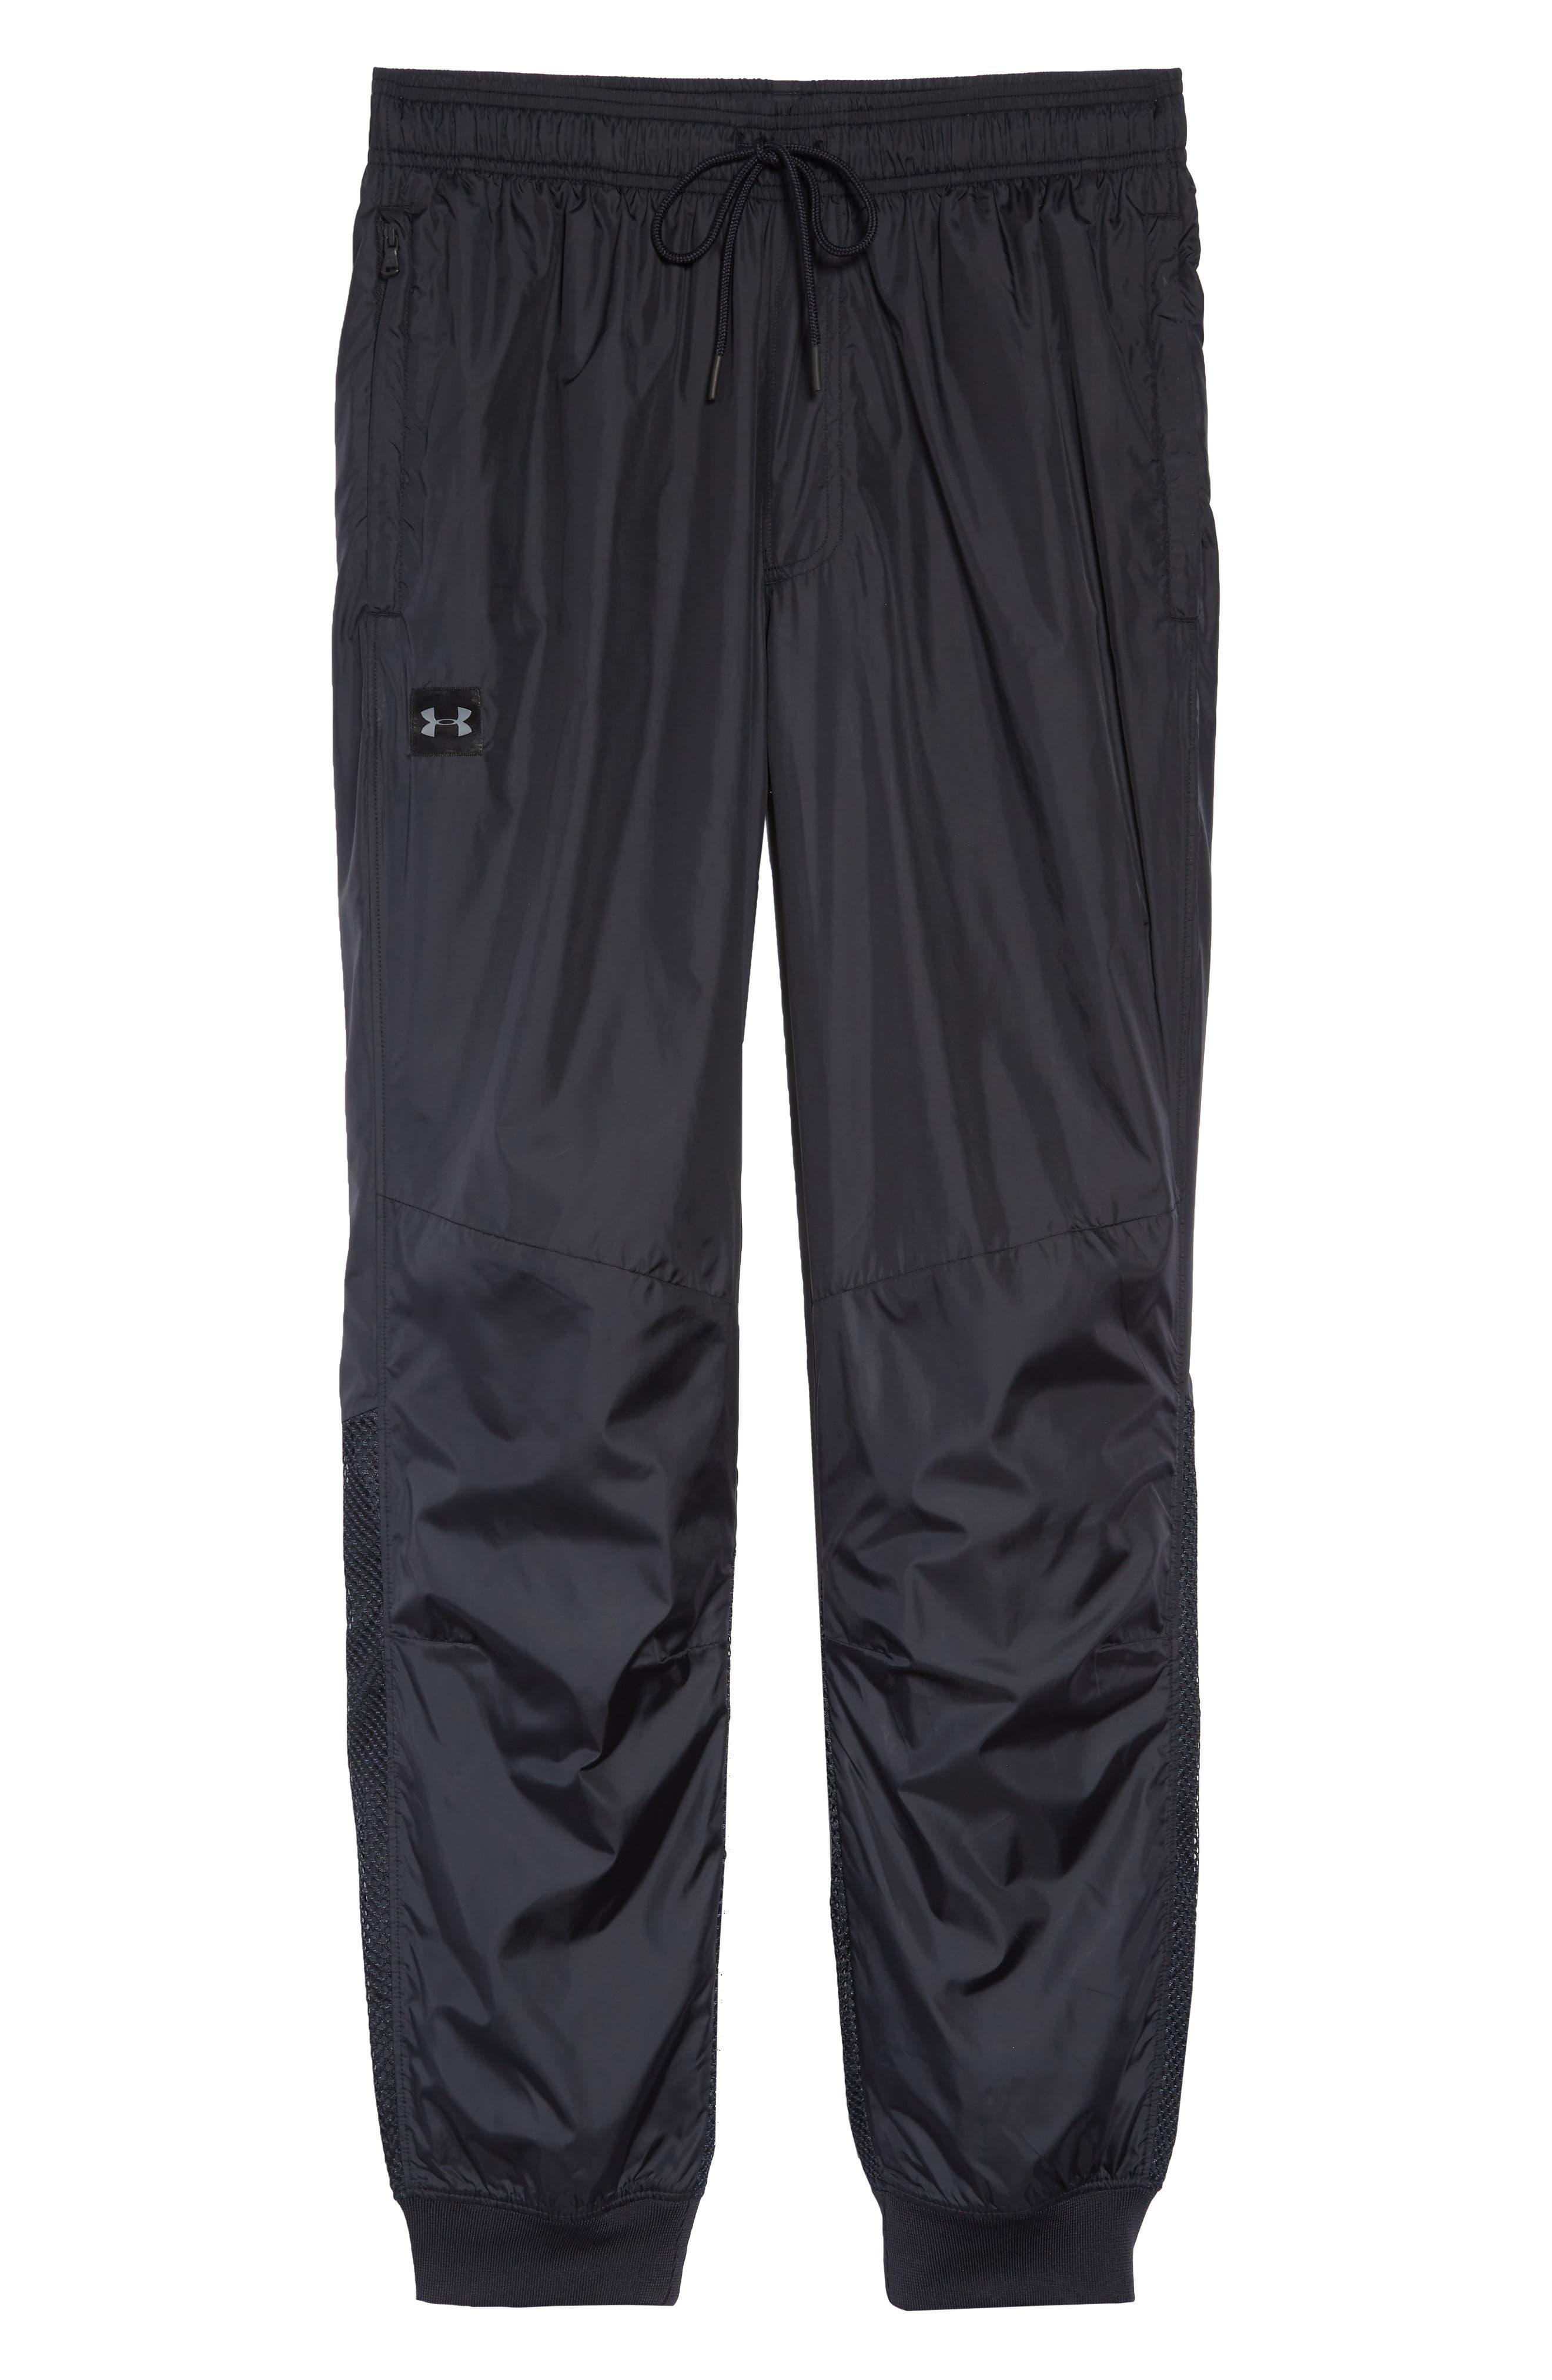 UNDER ARMOUR,                             Sportstyle Wind Pants,                             Alternate thumbnail 6, color,                             BLACK